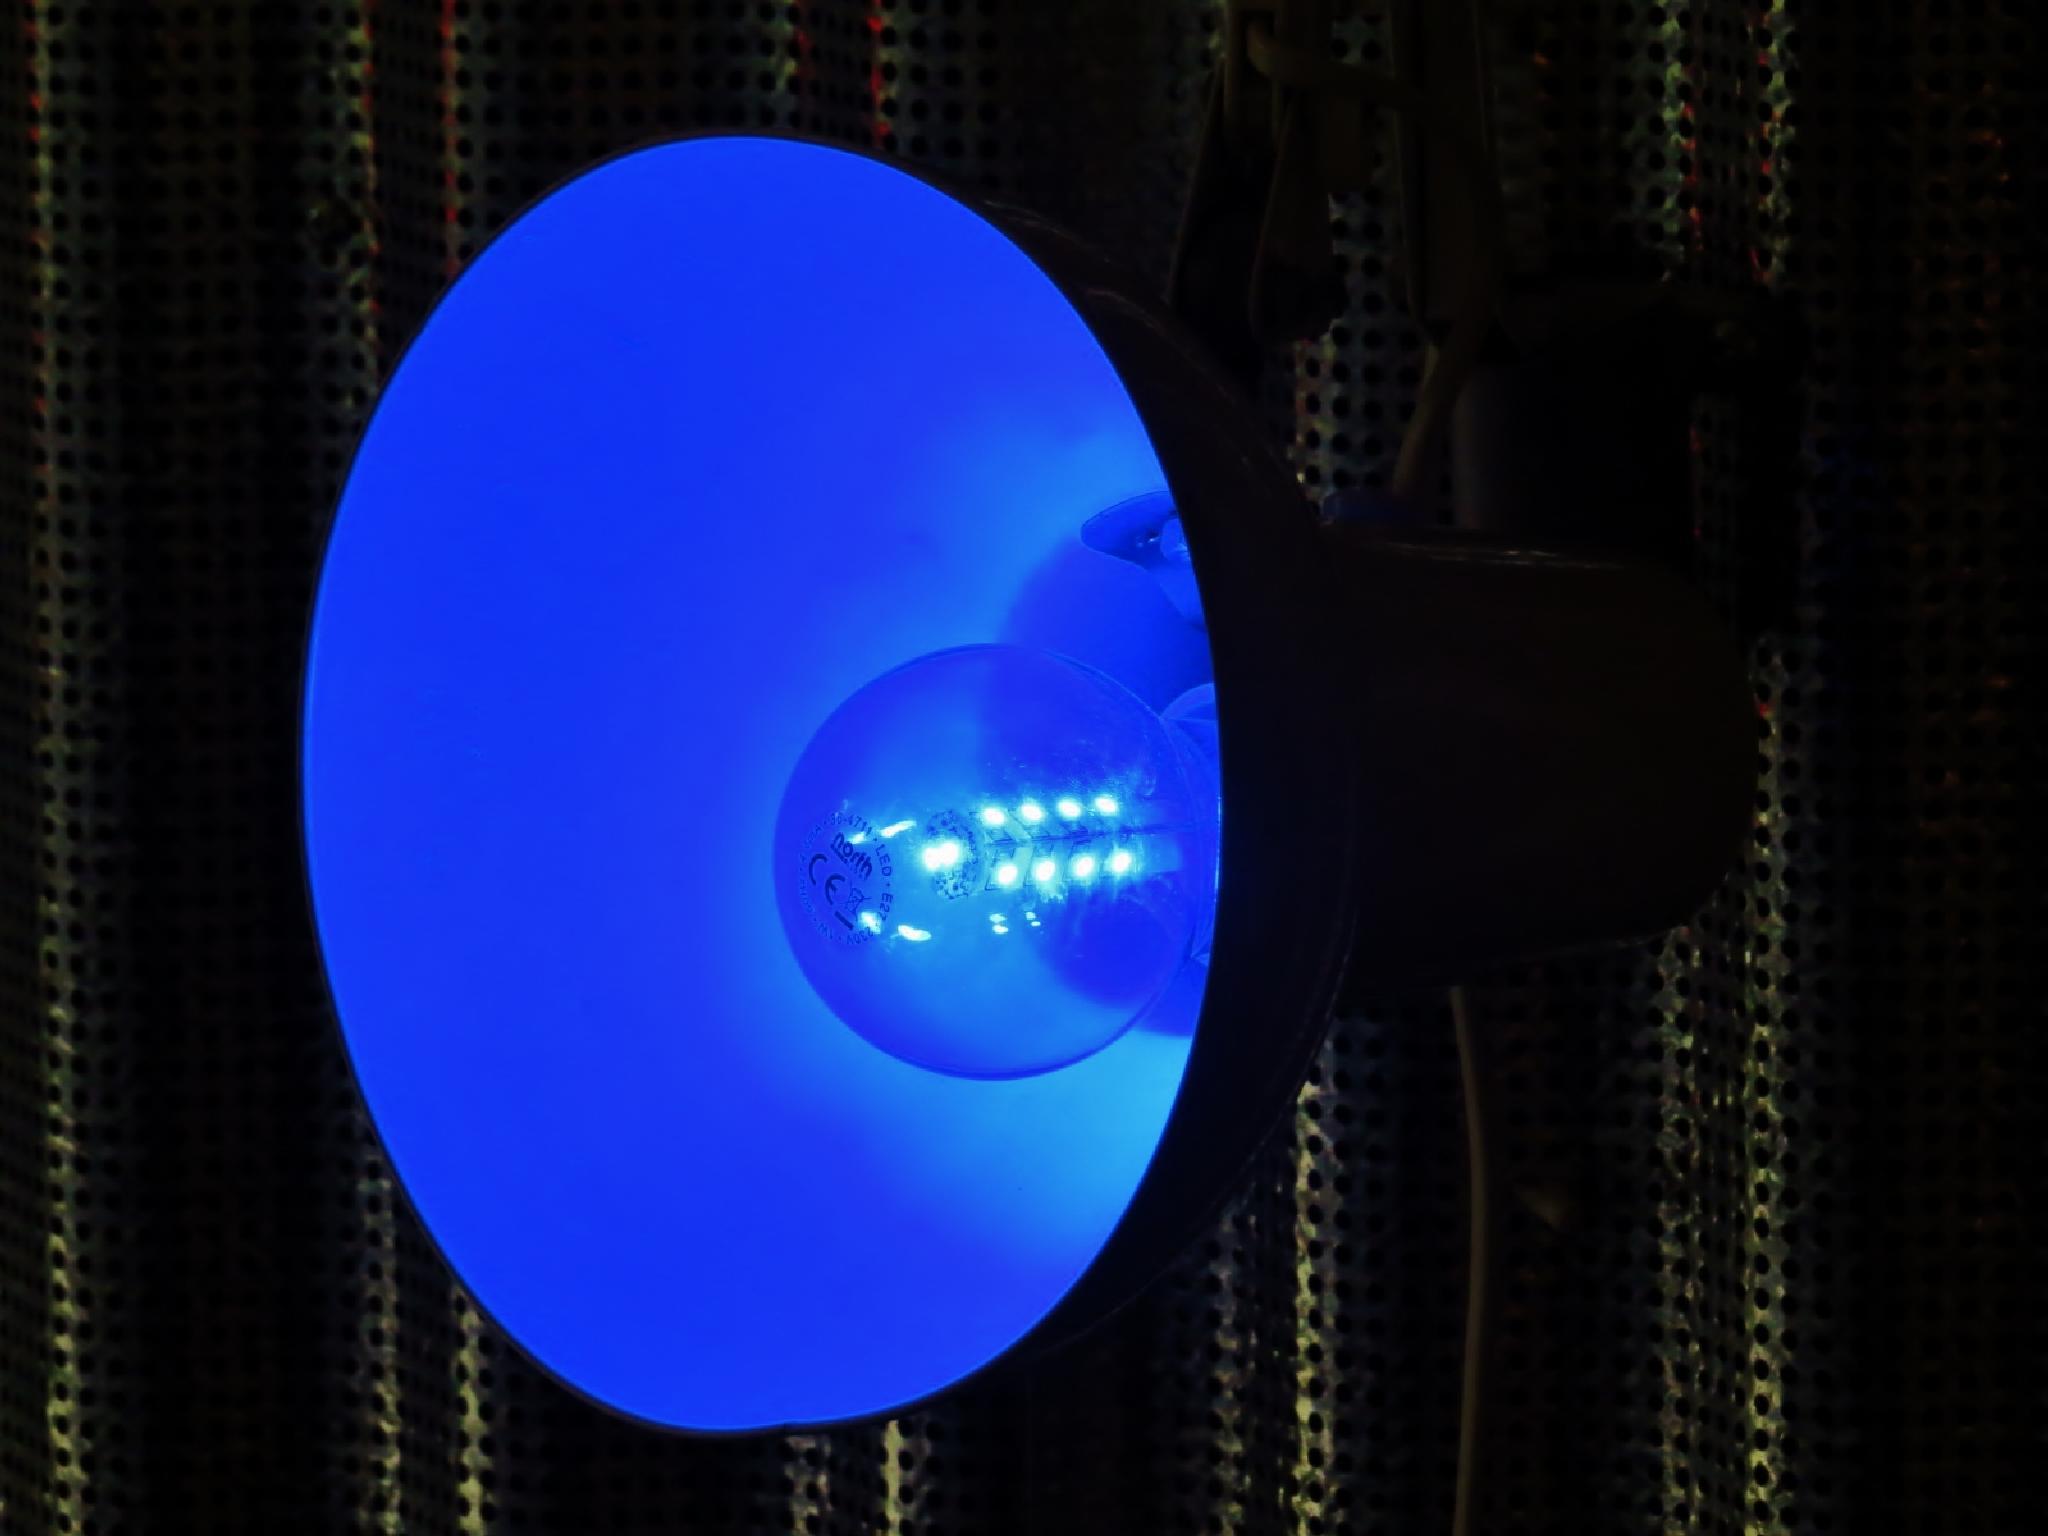 Feeling Blue by Thor Dullum